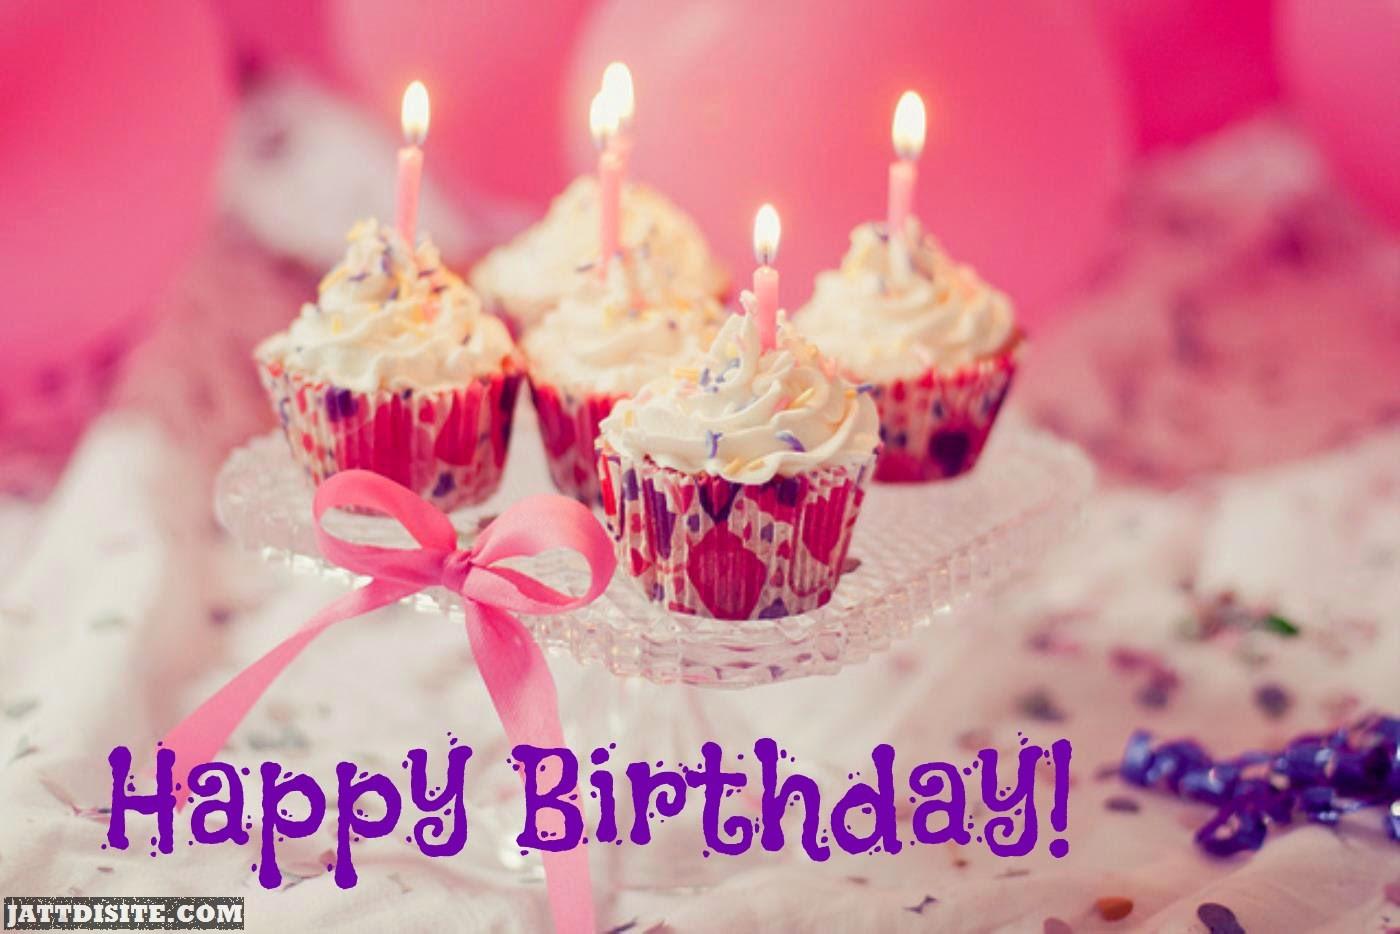 Birthday Cake Wishes  Happy Birthday Page 5